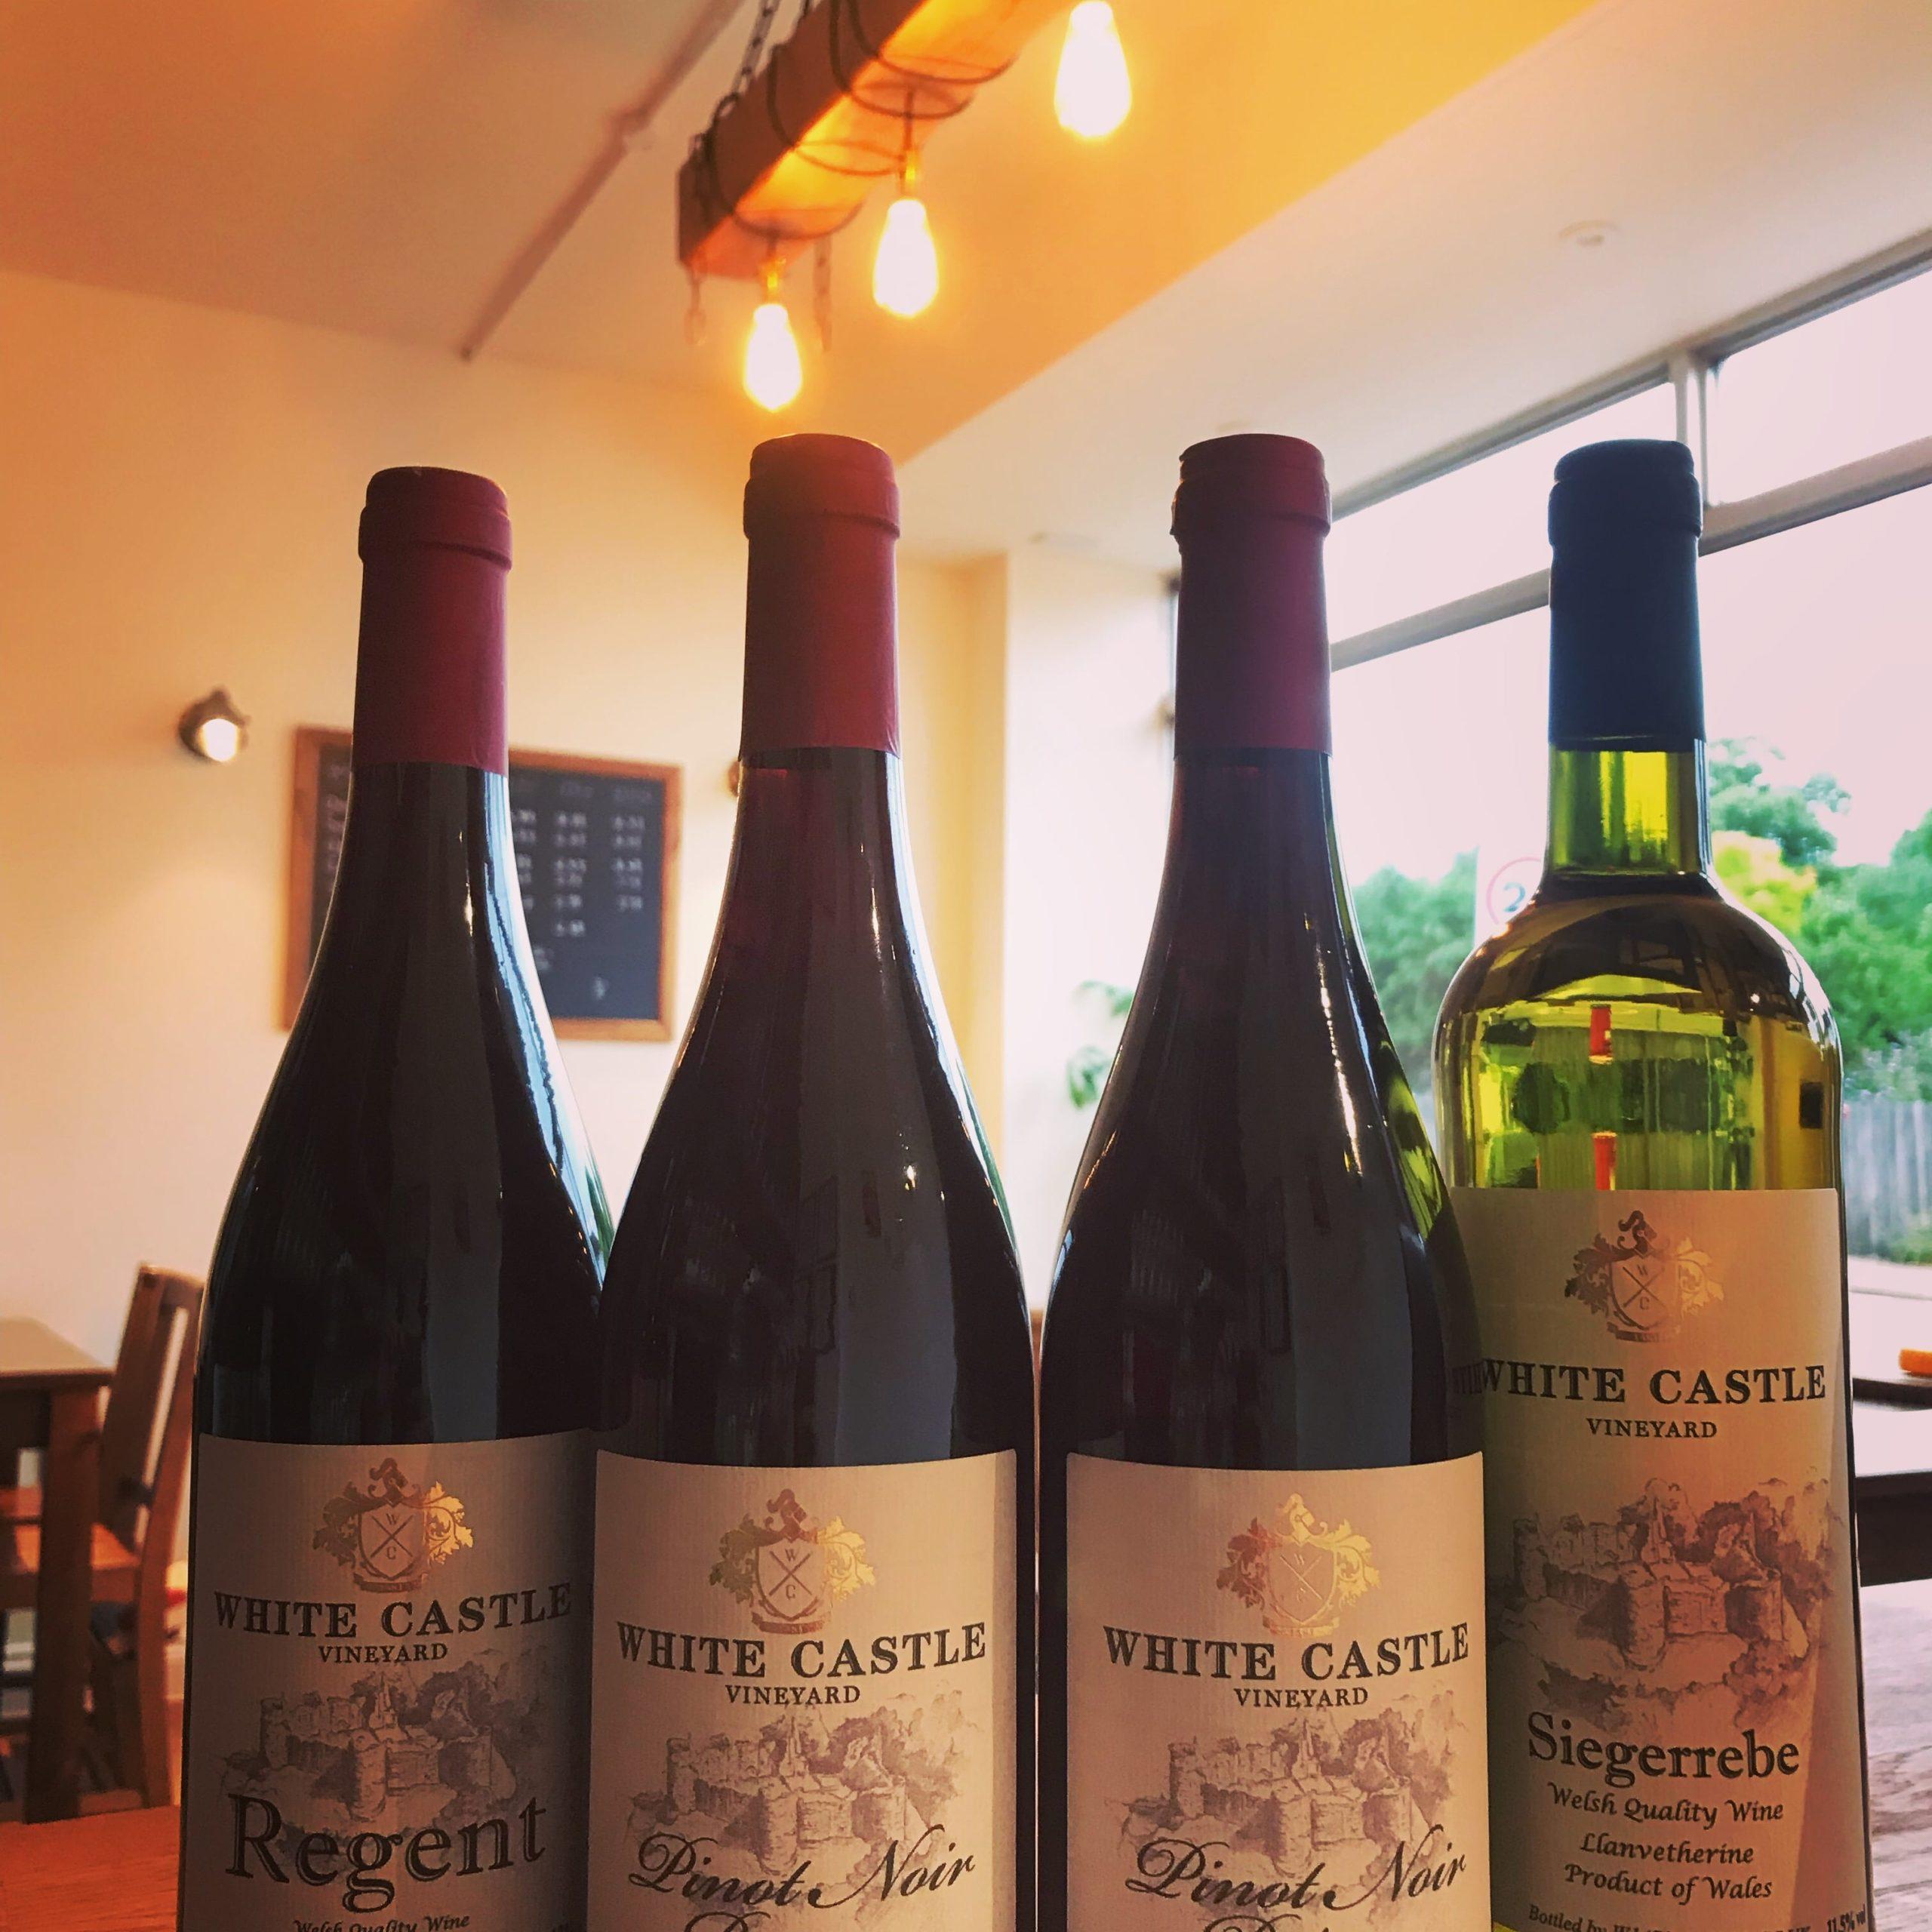 White Castle Vineyard wines shot